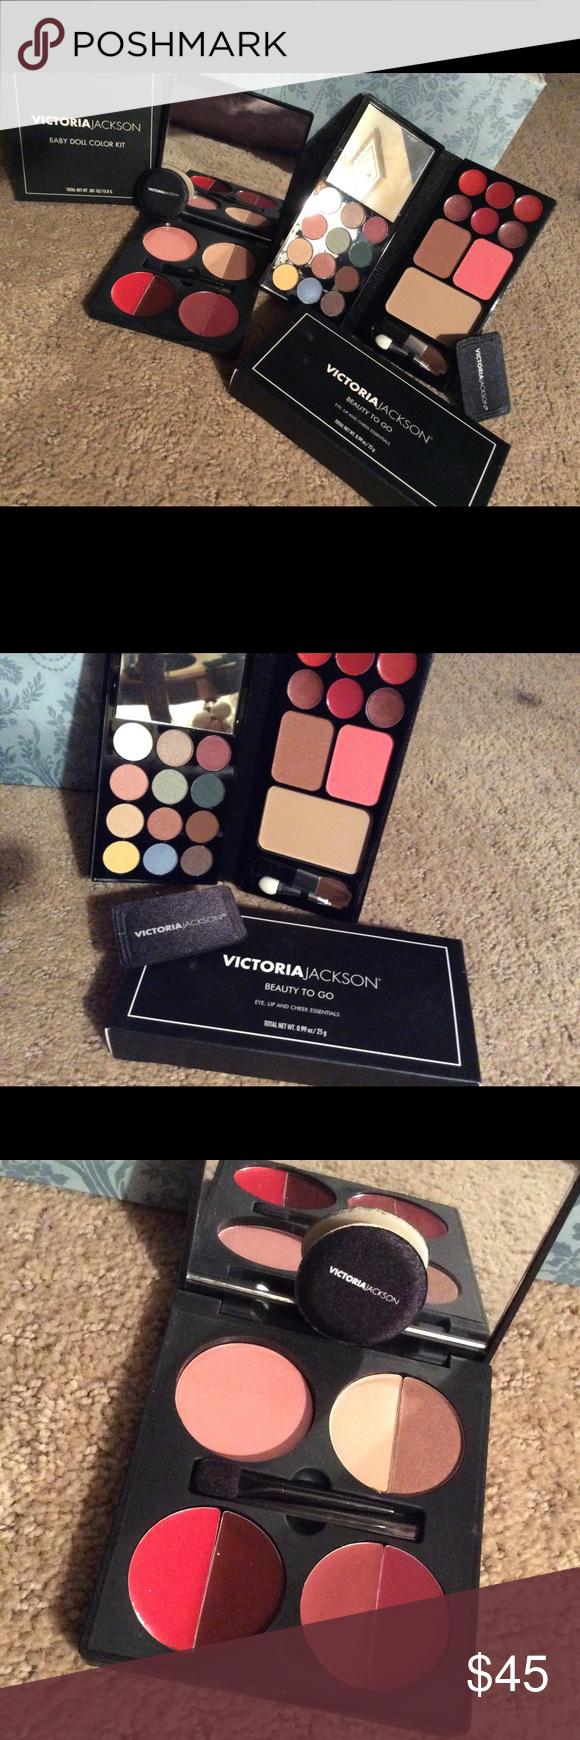 Two Brand New Luxurious Makeup Kits NWT Makeup kit